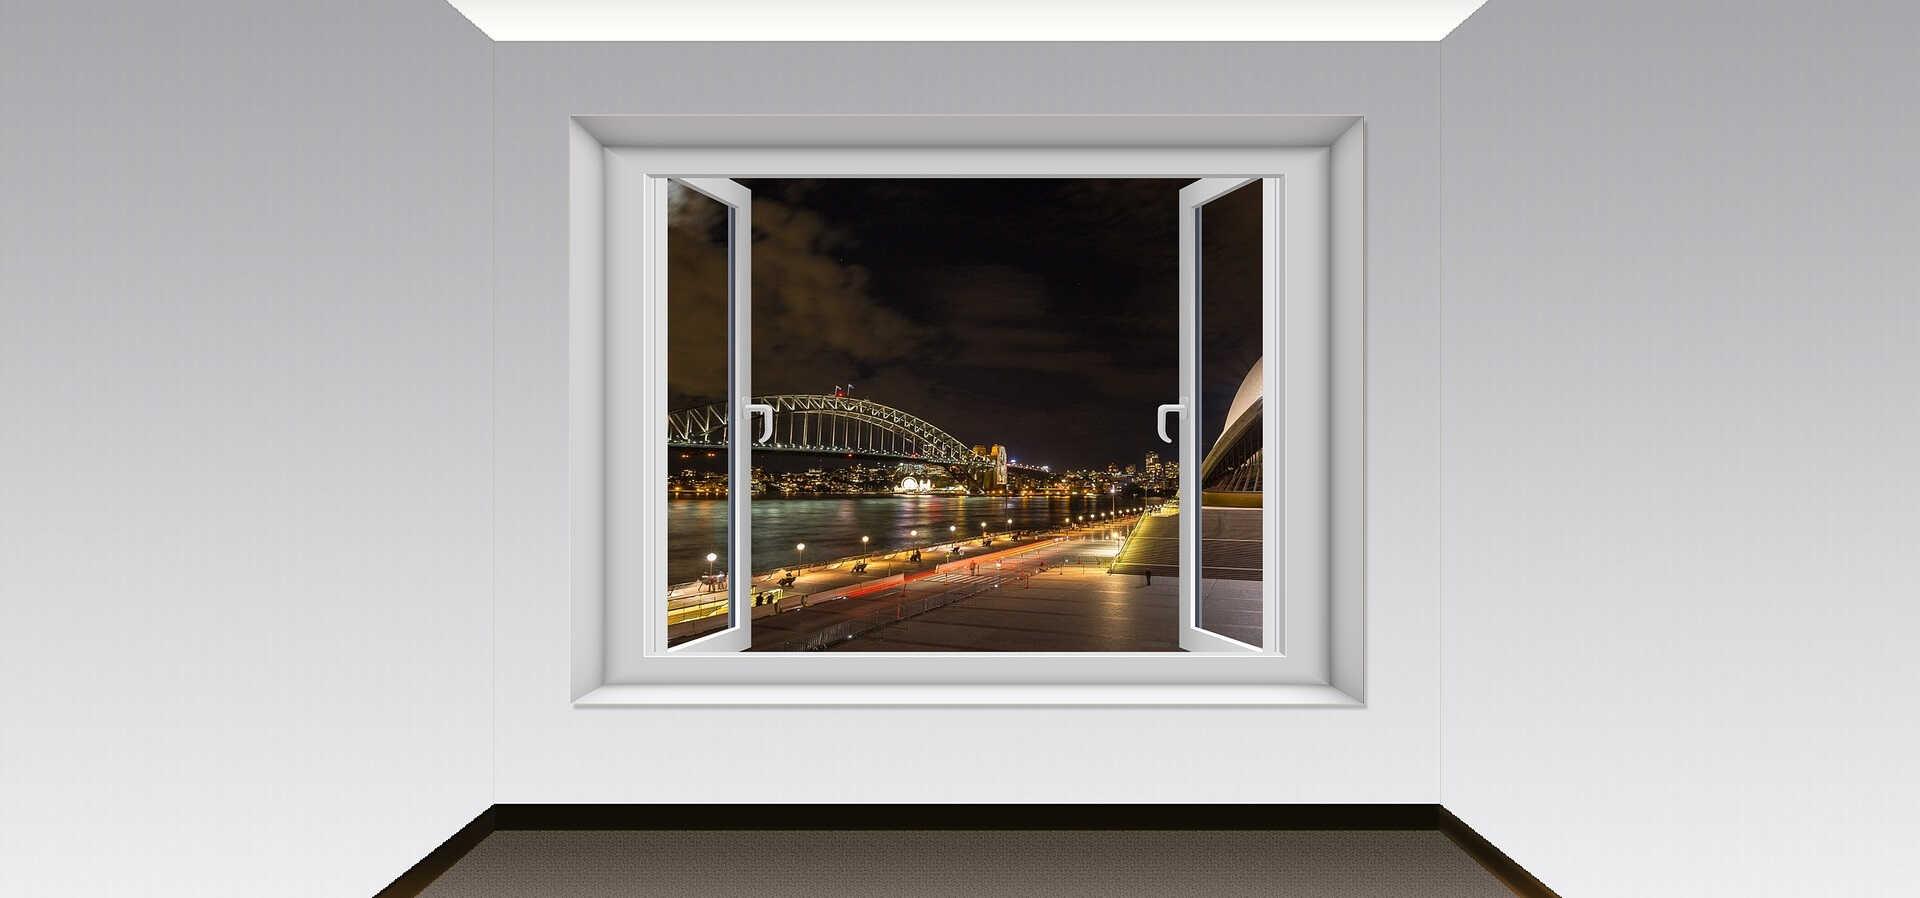 Fenstergriffe Fenster Drücker gimp 50